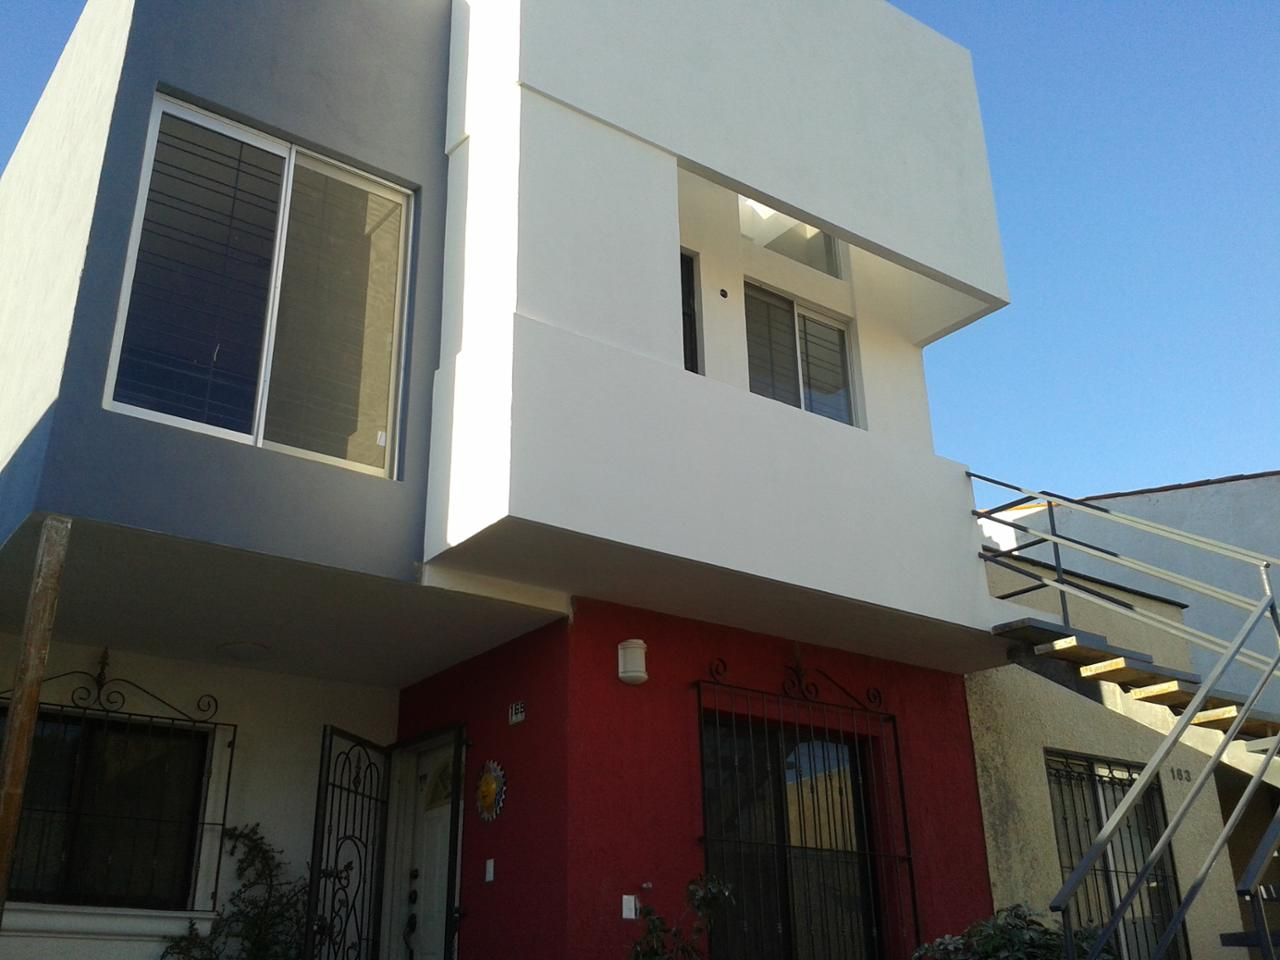 Casas econ micas en renta en zapopan jalisco for Alquiler de casa para estudiantes